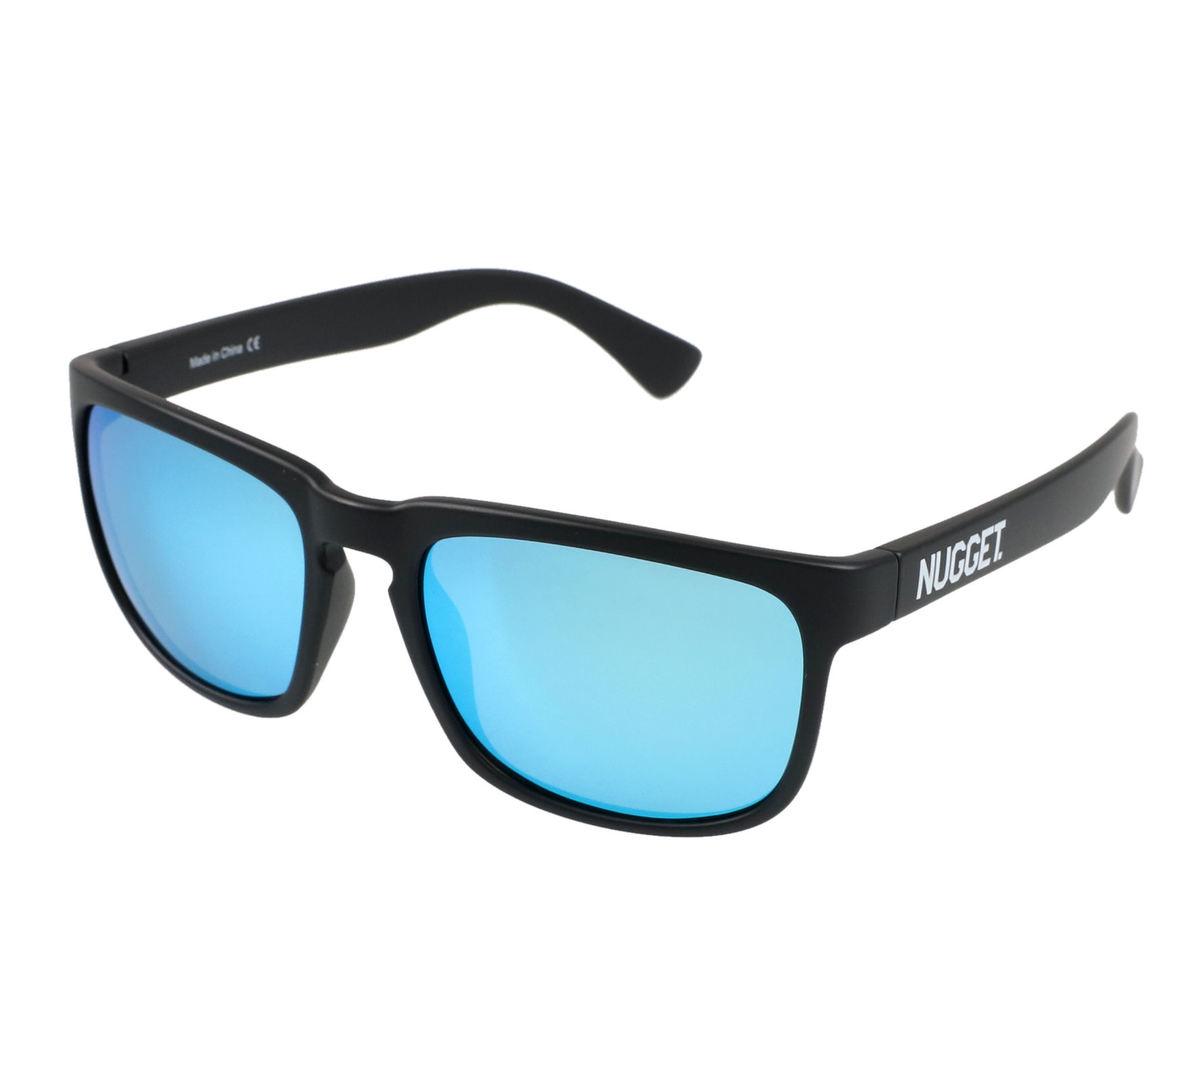 okuliare slnečné NUGGET - CLONE A 4/17/38 - BLACK BLUE - MEAT134